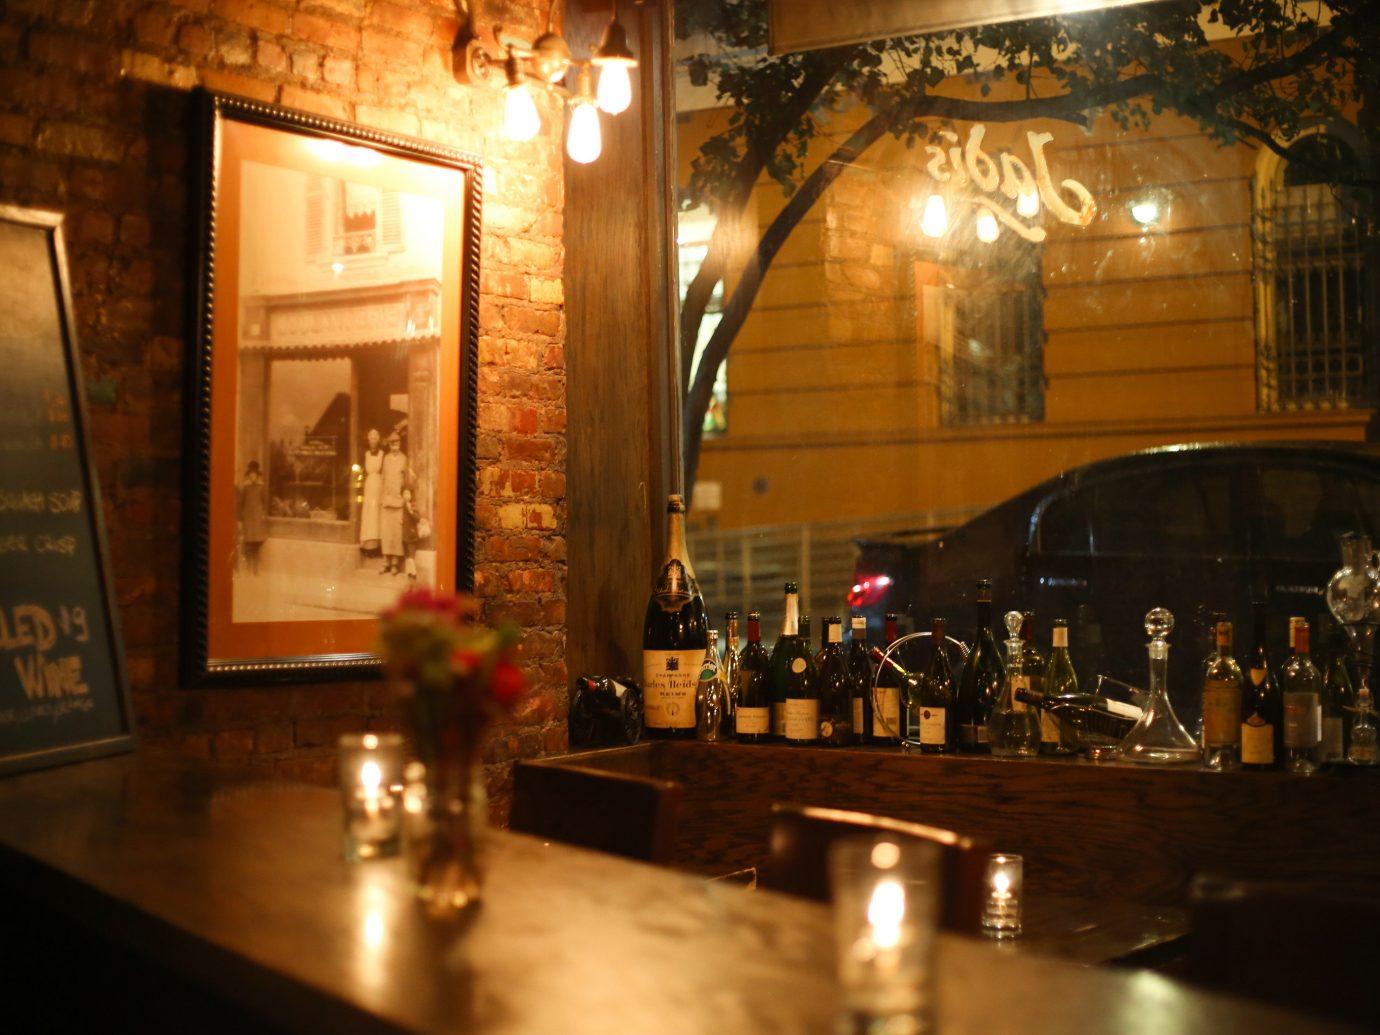 Food + Drink Romance indoor night Bar restaurant interior design tourist attraction dining room